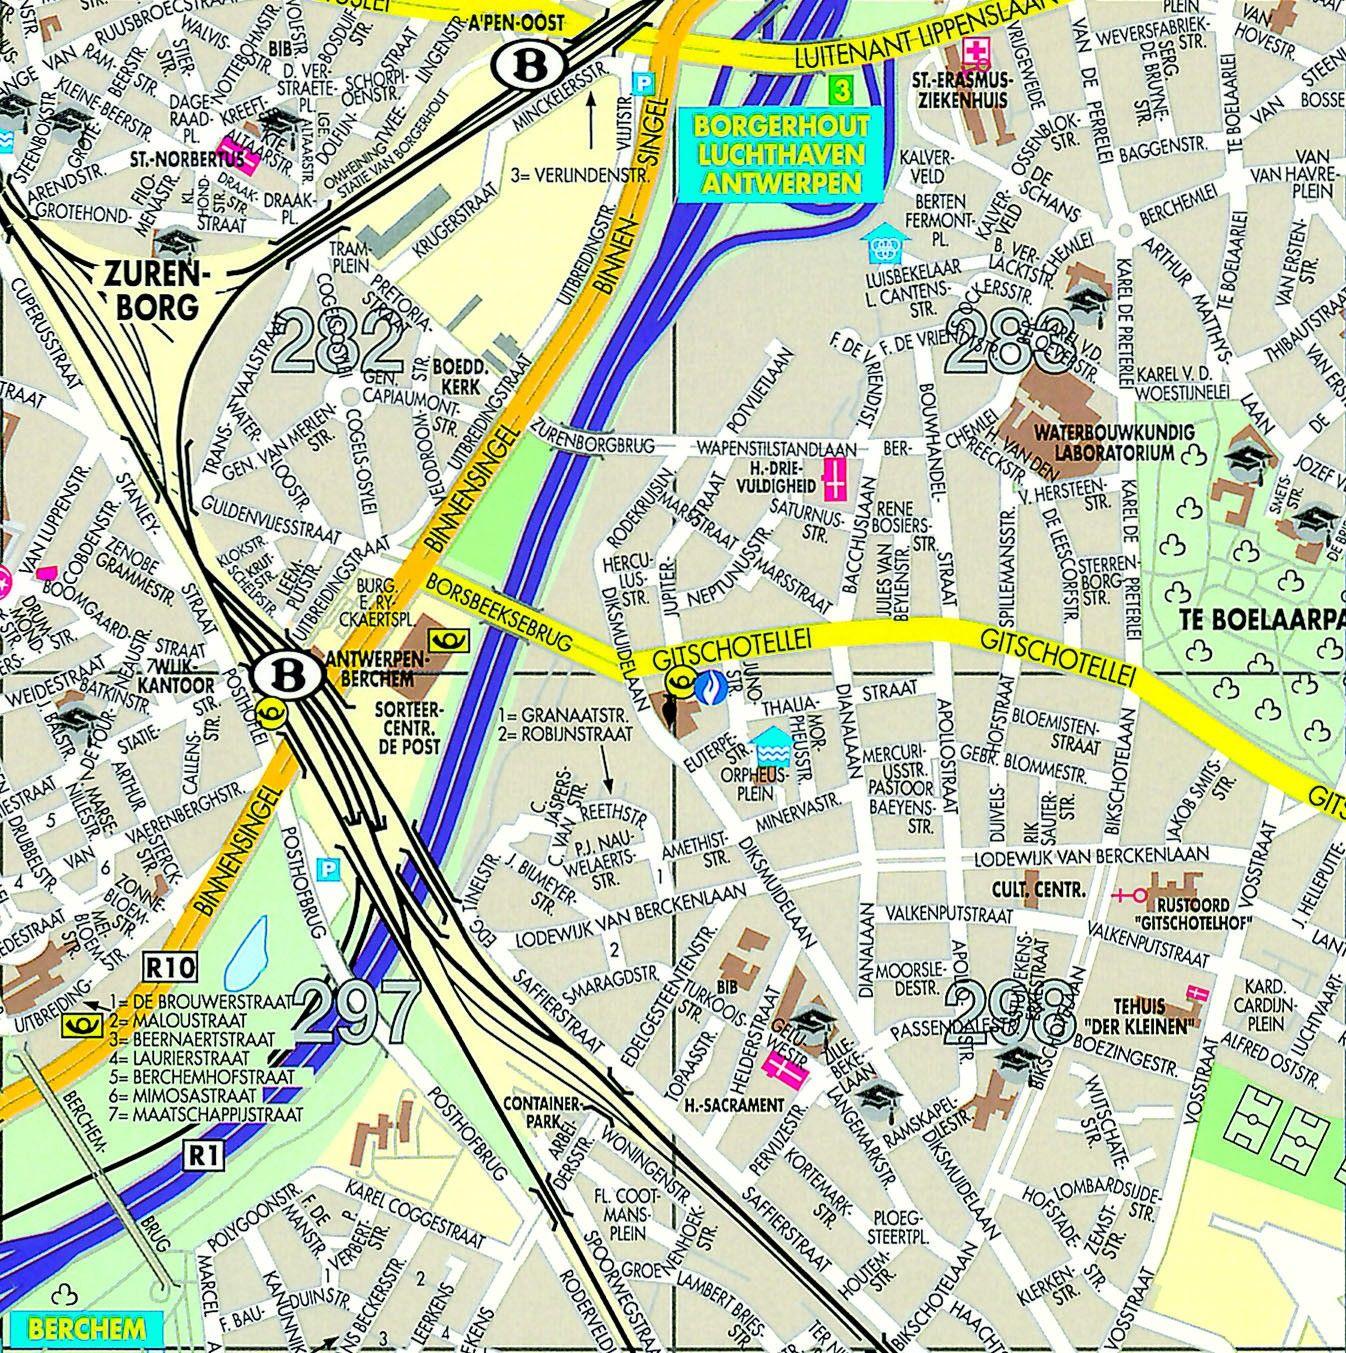 Stadsplattegrond Antwerpen